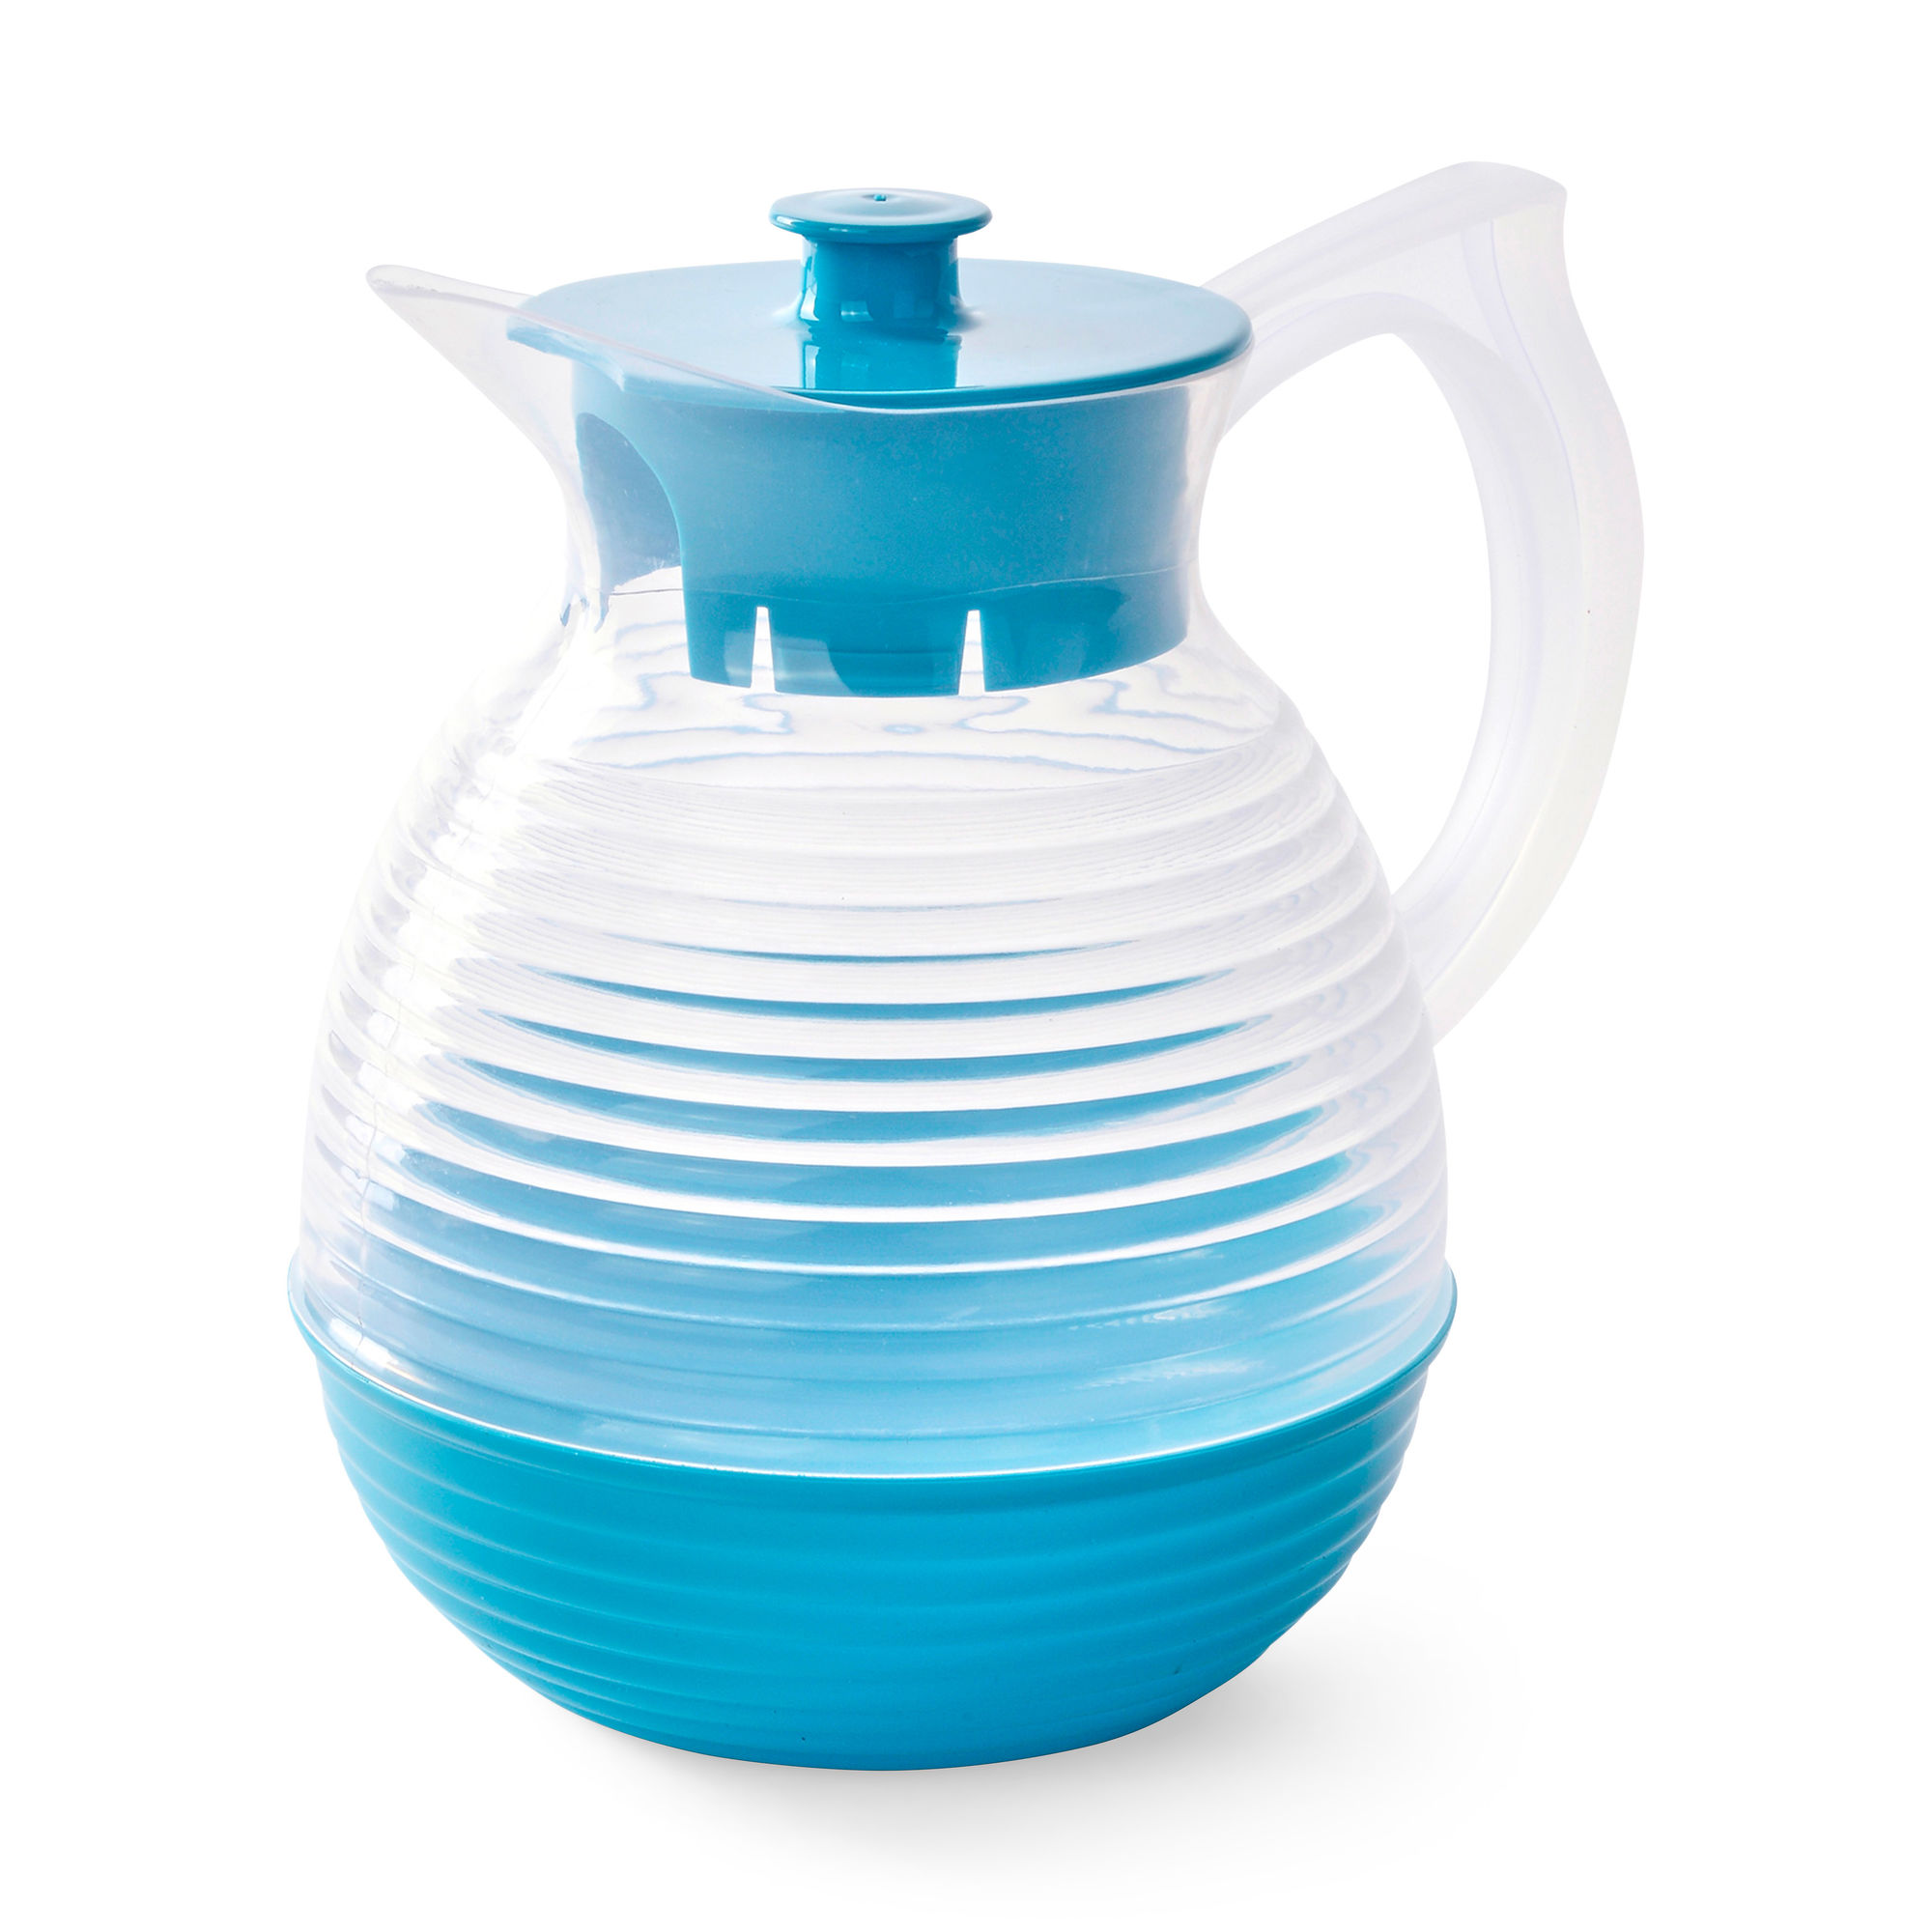 La Carafe ブルーの商品画像